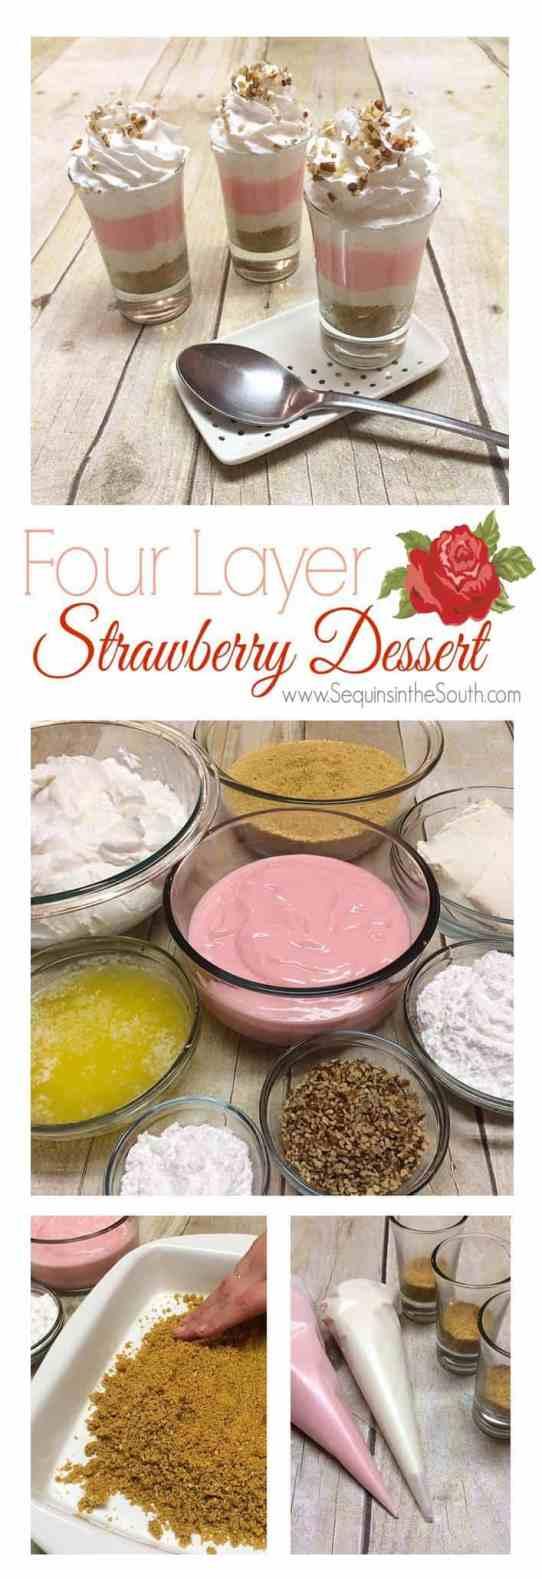 1.30 Four Layer Strawberry Dessert VERTICAL 7